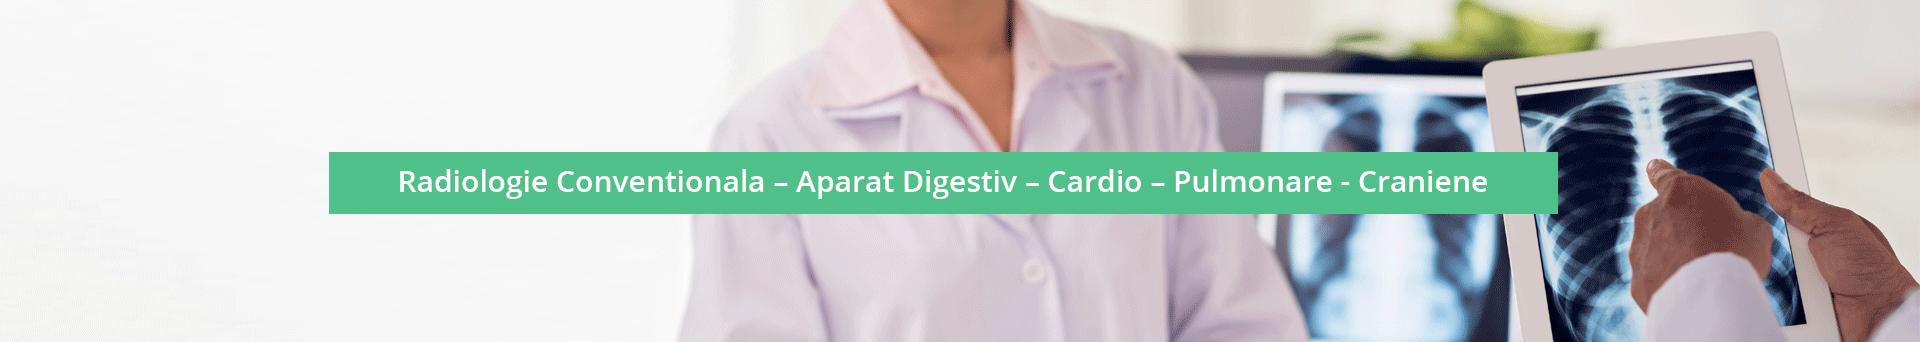 Radiologie Conventionala – Aparat Digestiv – Cardio – Pulmonare - Craniene